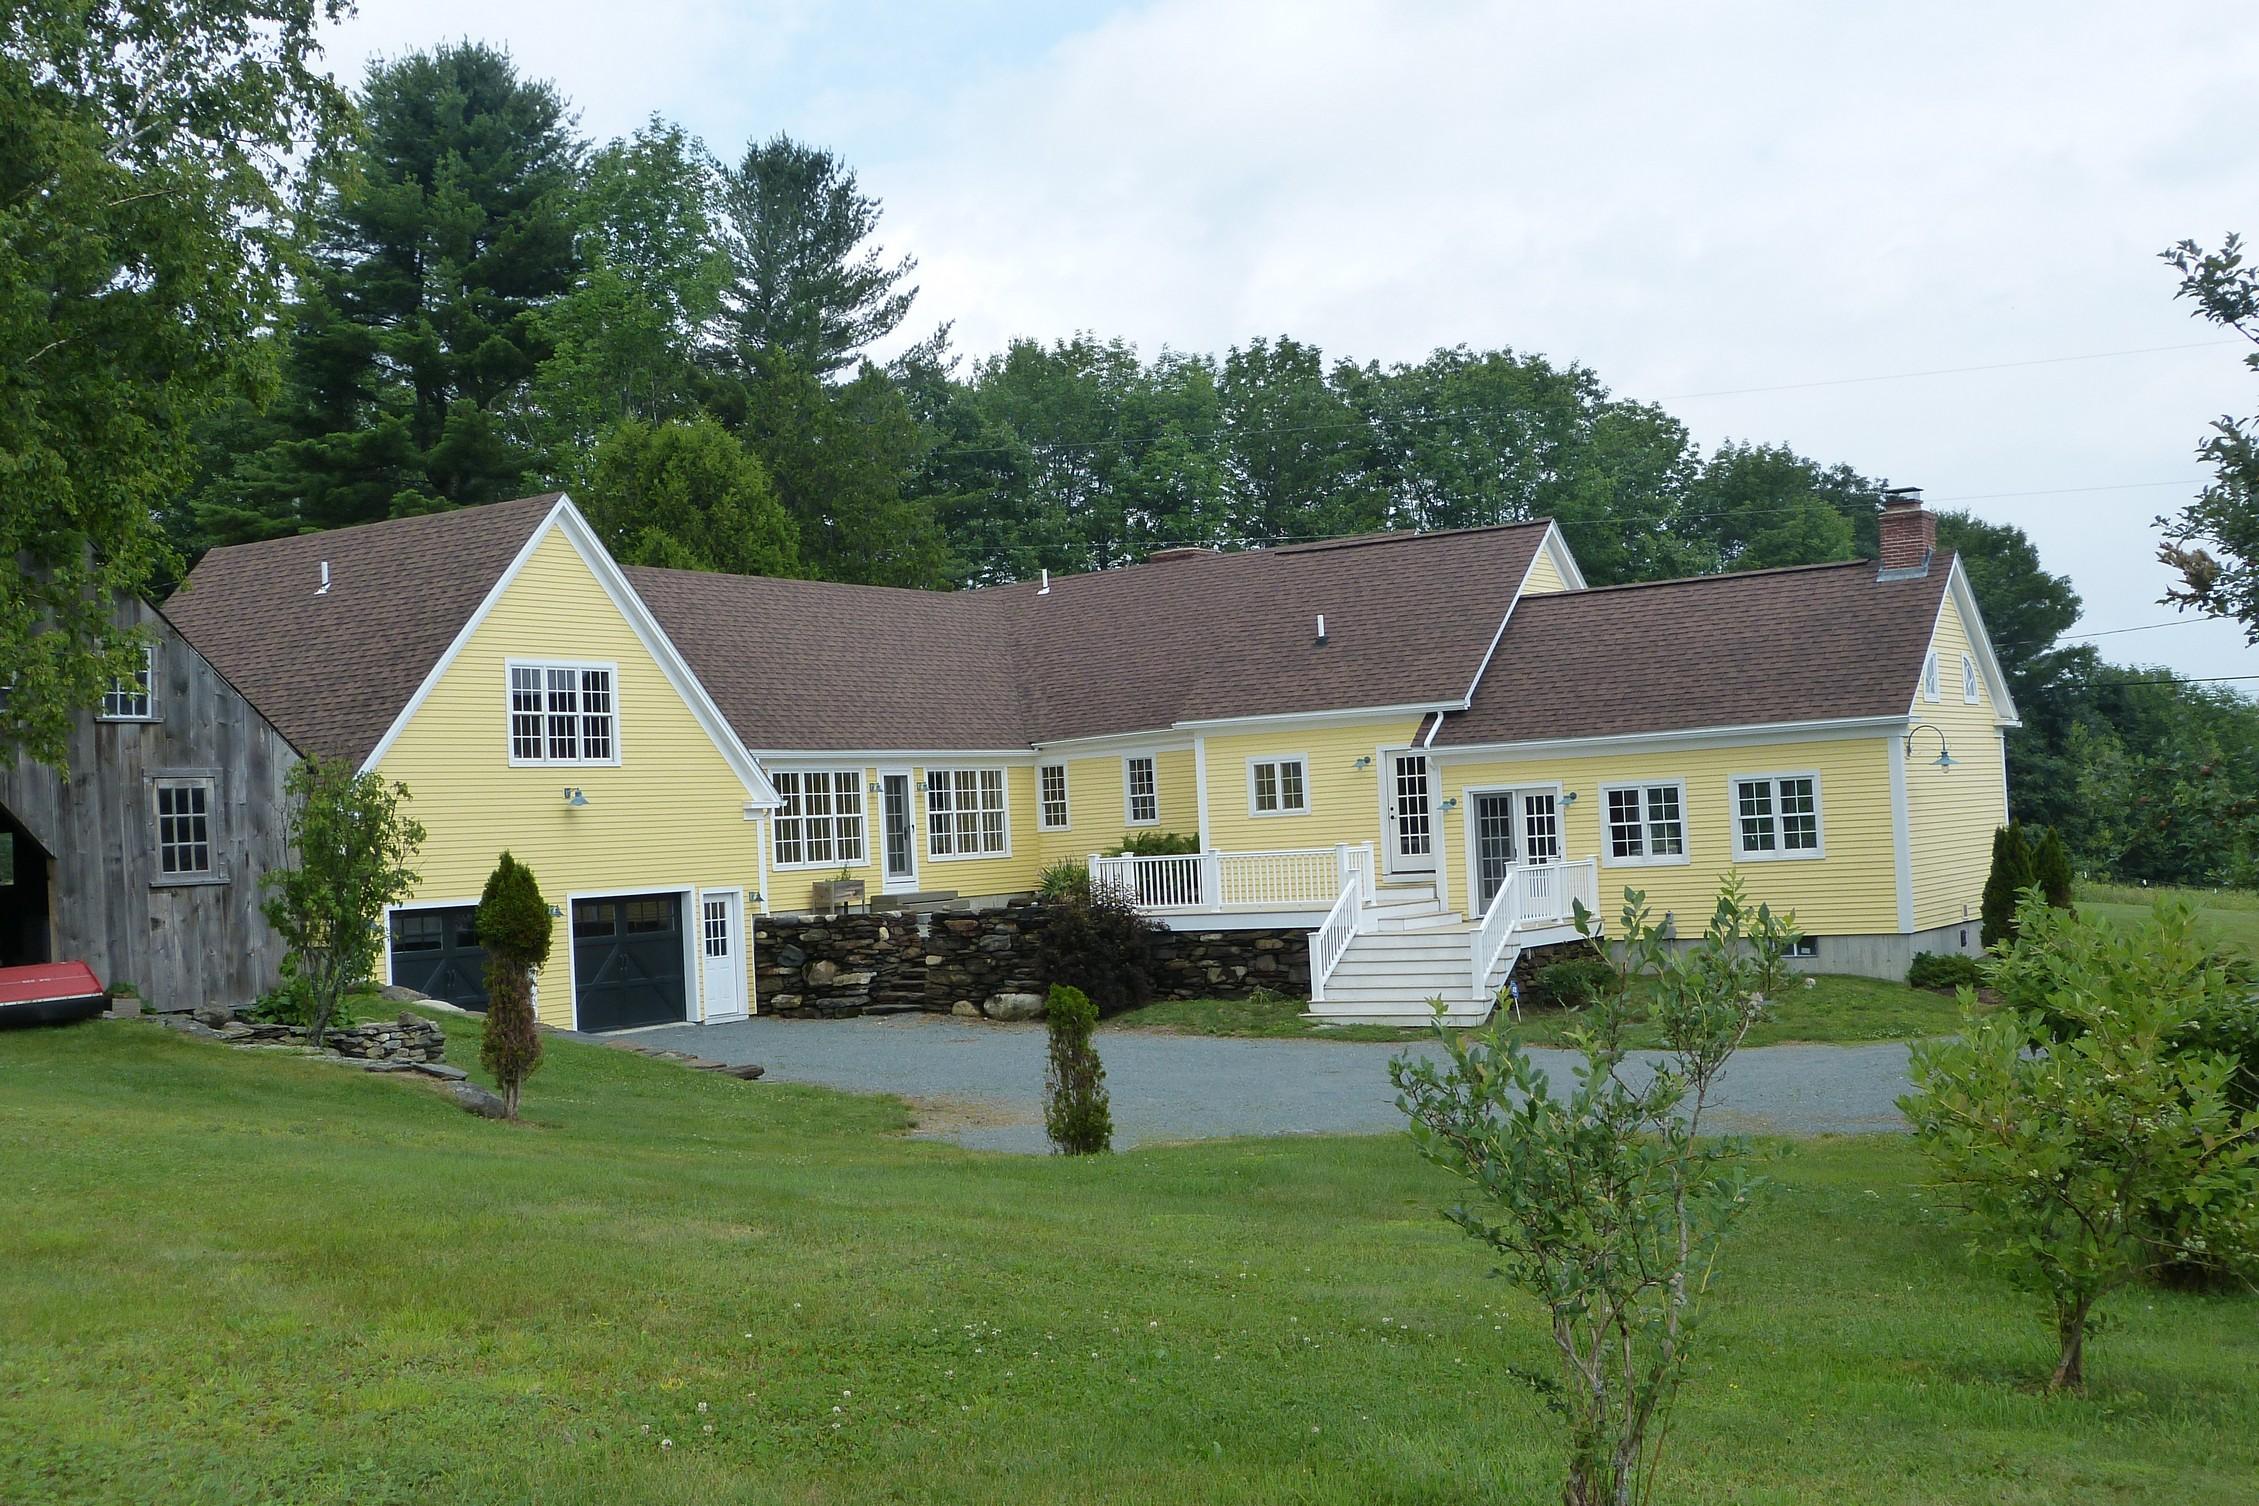 Single Family Home for Sale at 187 Skinny Ridge Road, Lyman 187 Skinny Ridge Rd Lyman, New Hampshire, 03585 United States